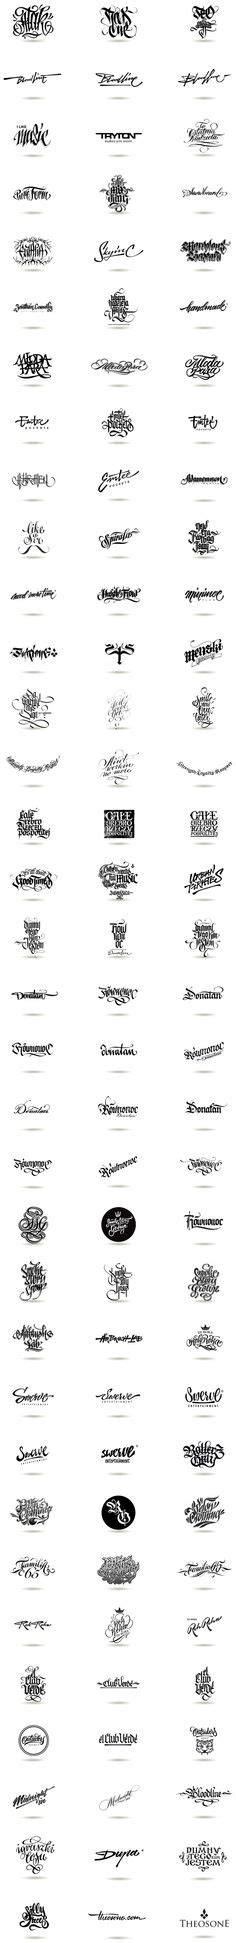 Custom Font Nameset Persib Bandung 2010 2011 marijuana tattoos how to draw cannabis cannabis leaf step by step pop culture